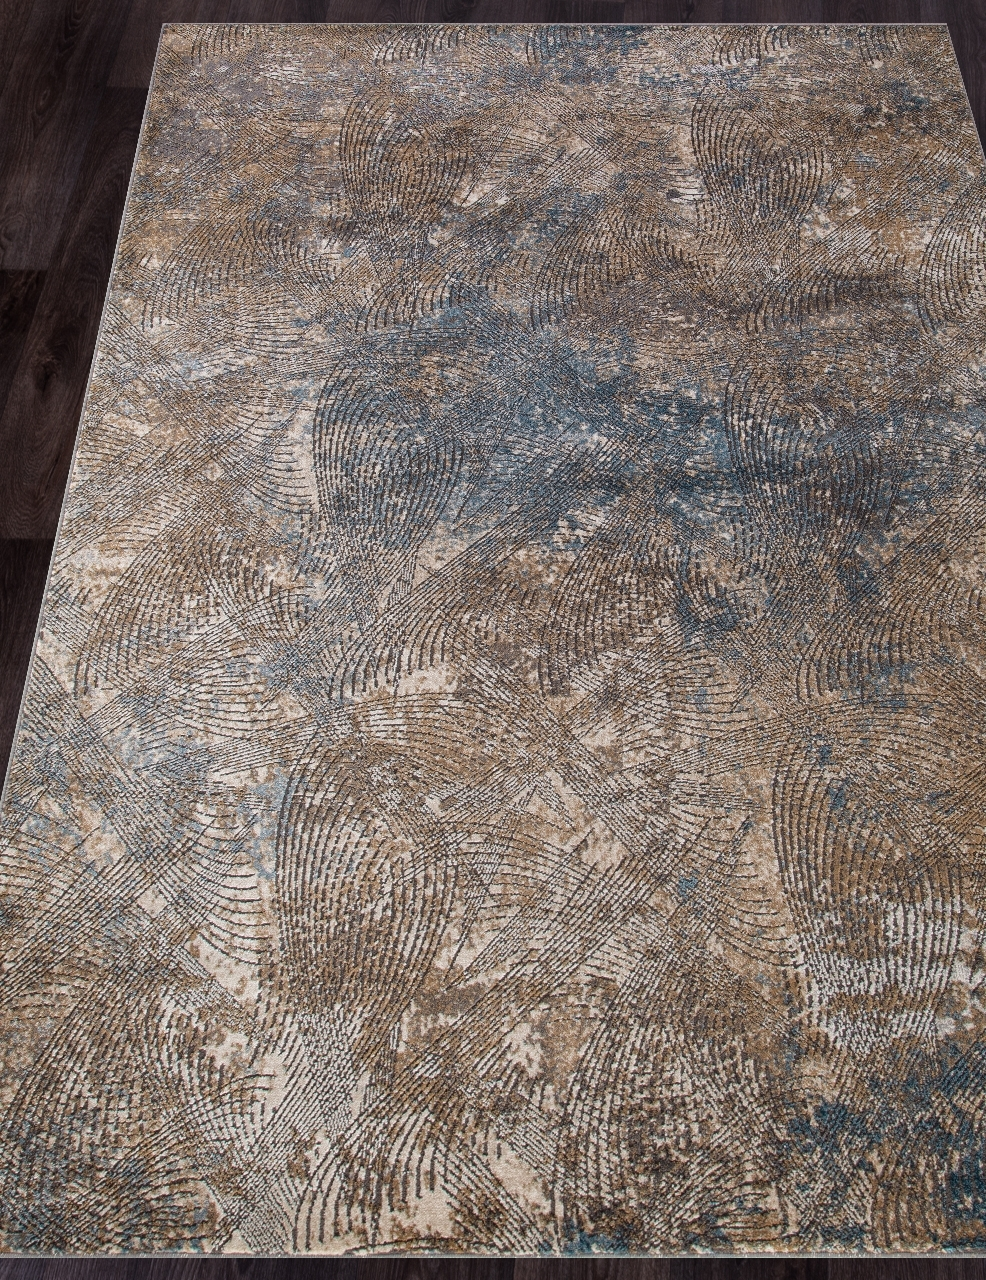 Ковер D769 - MUSTARD - Прямоугольник - коллекция SERENITY